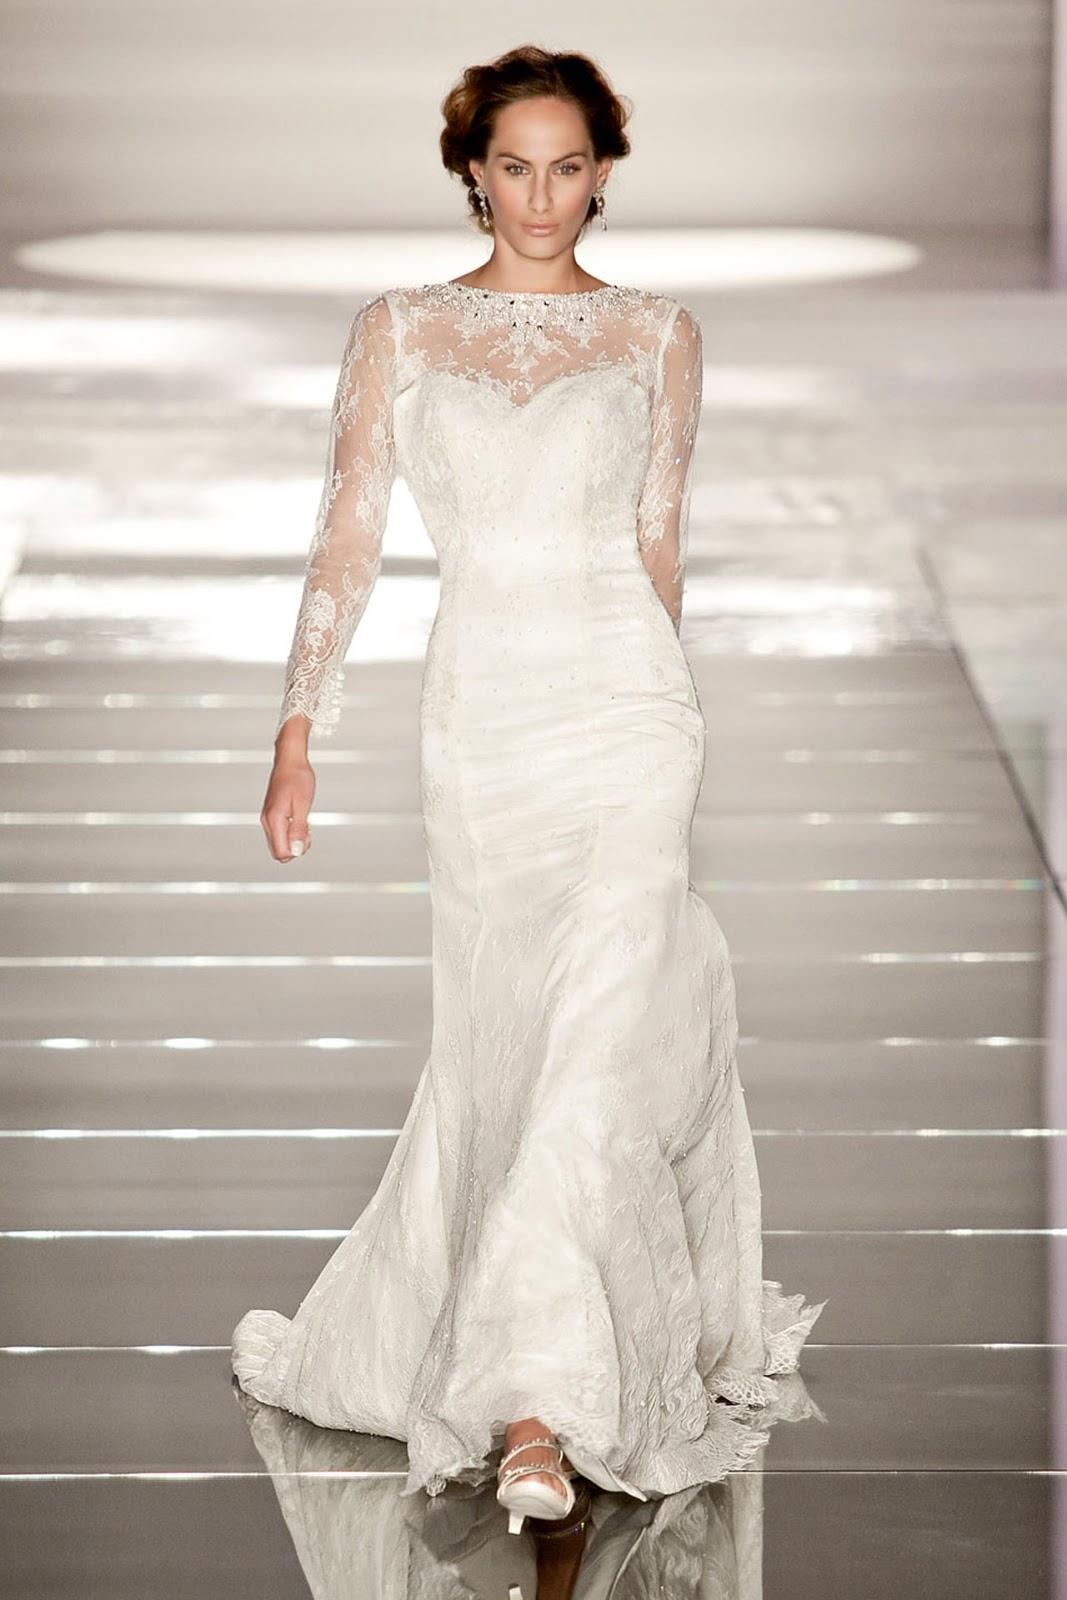 abiti sposa 2015 Alessandra Rinaudo e matrimoni a tema idee